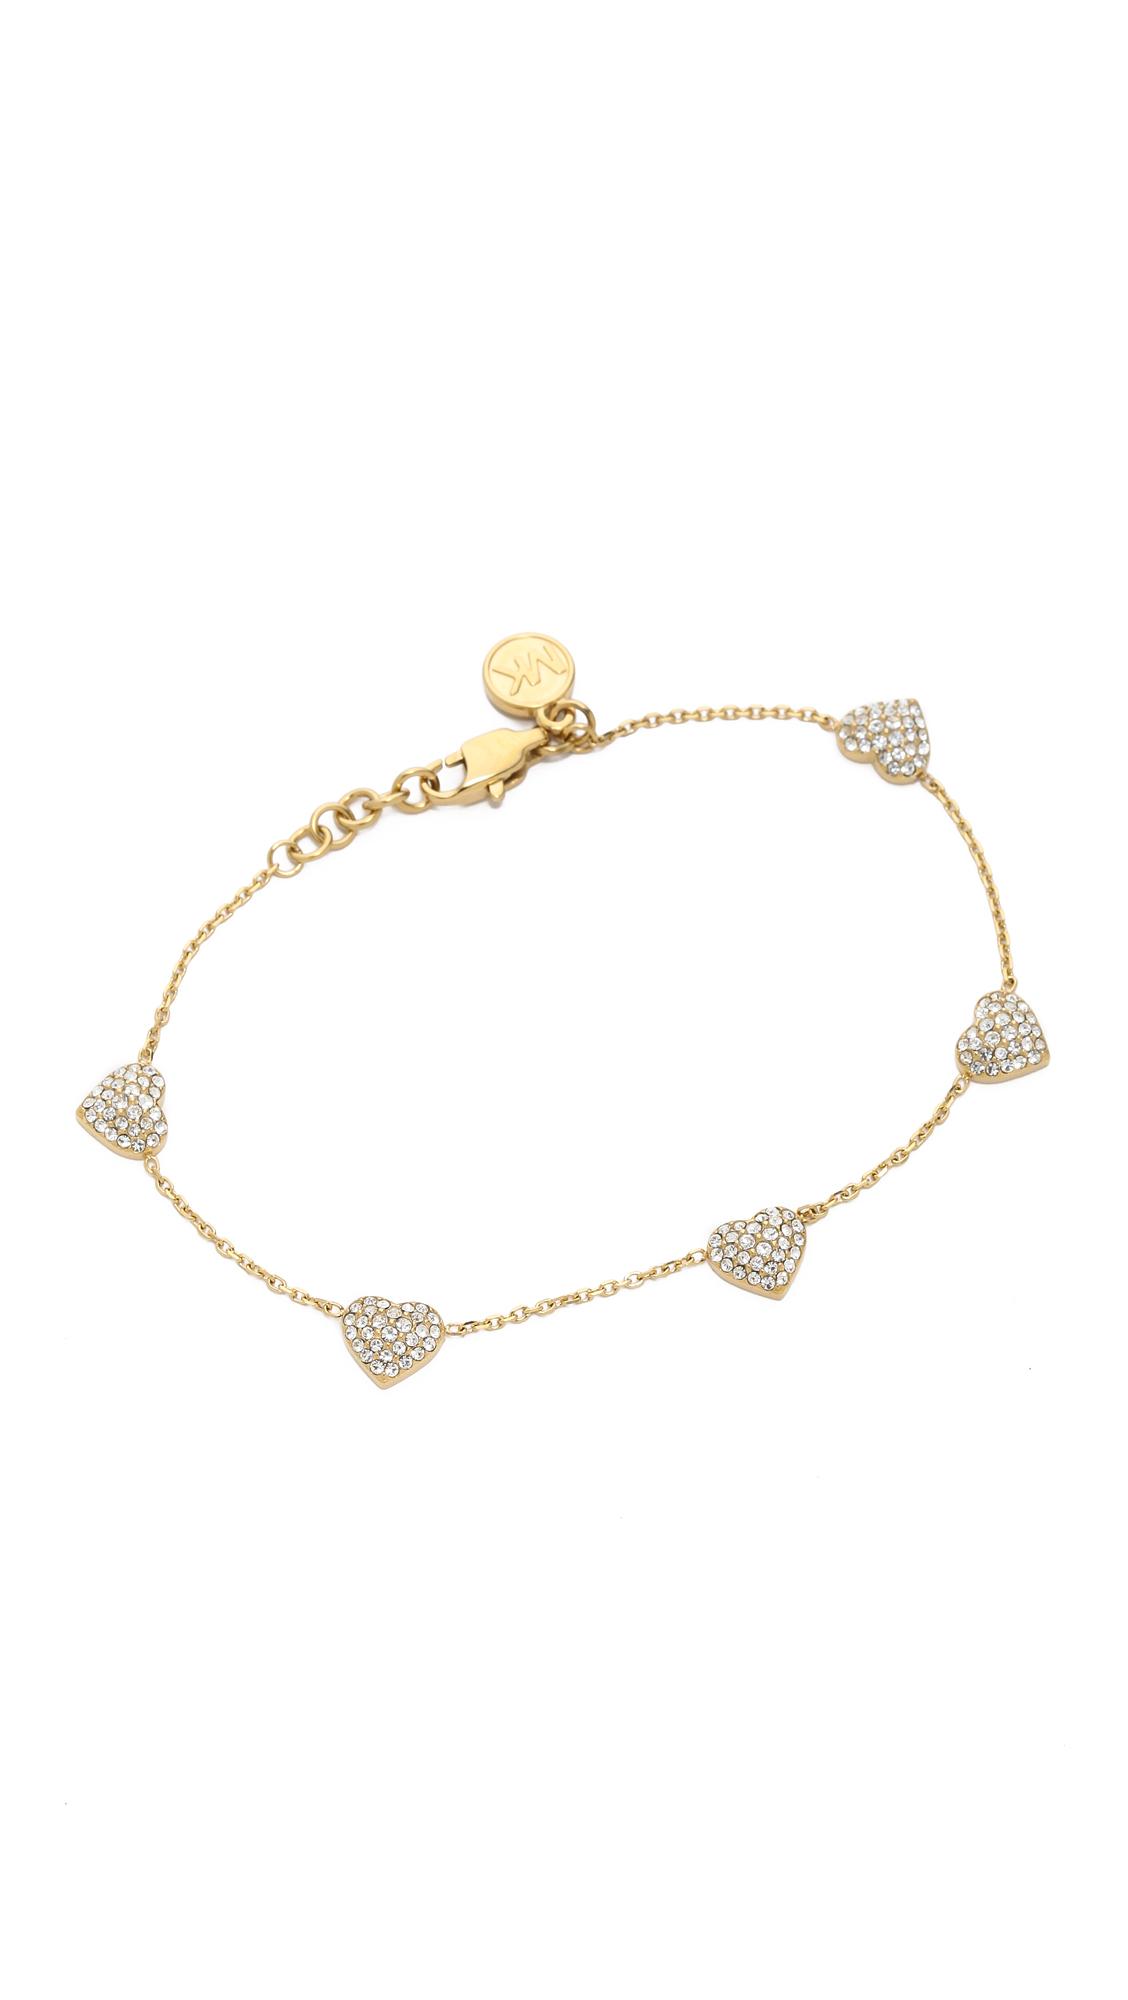 michael kors pave delicate bracelet in gold lyst